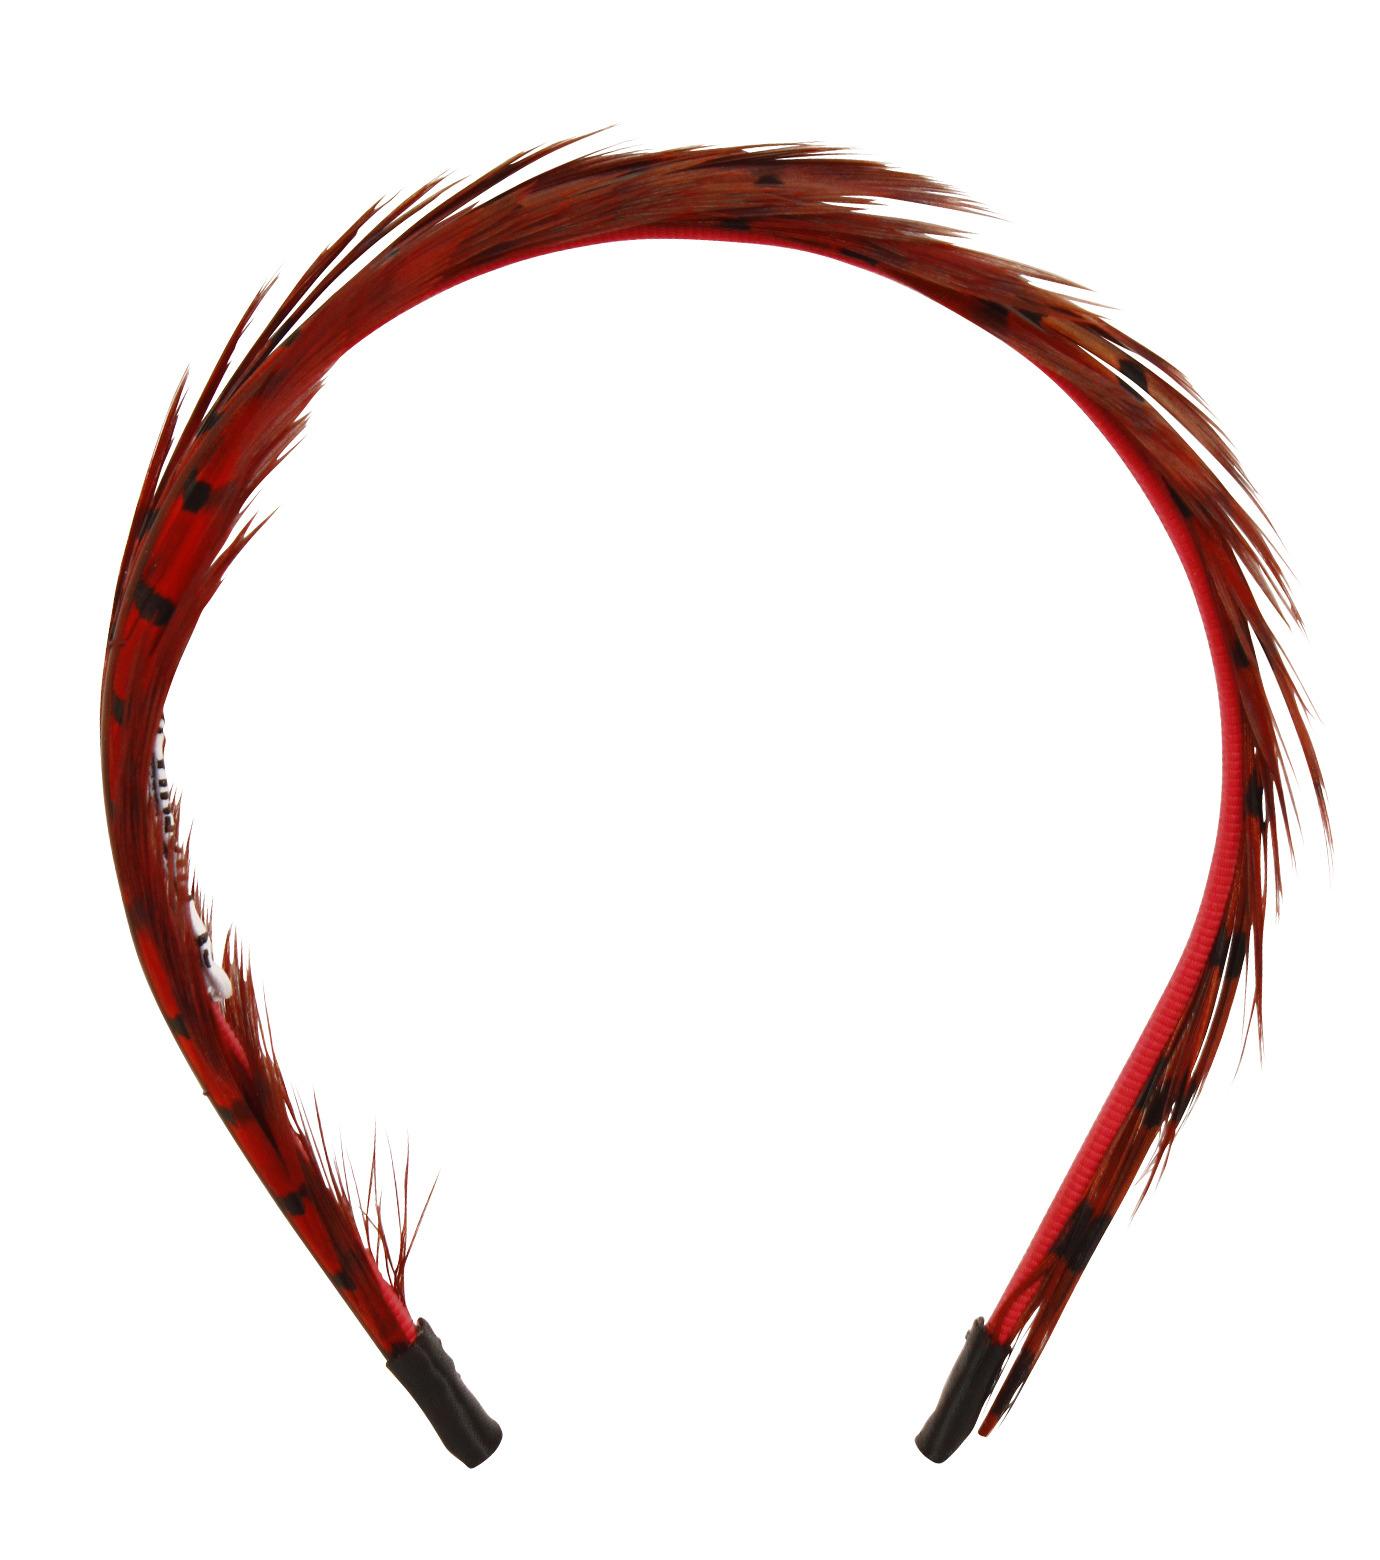 LE CIEL BLEU(ルシェルブルー)のFeather headband / Eugenia Kim-ROSE(アクセサリー/accessory)-2285-1449-L 拡大詳細画像1